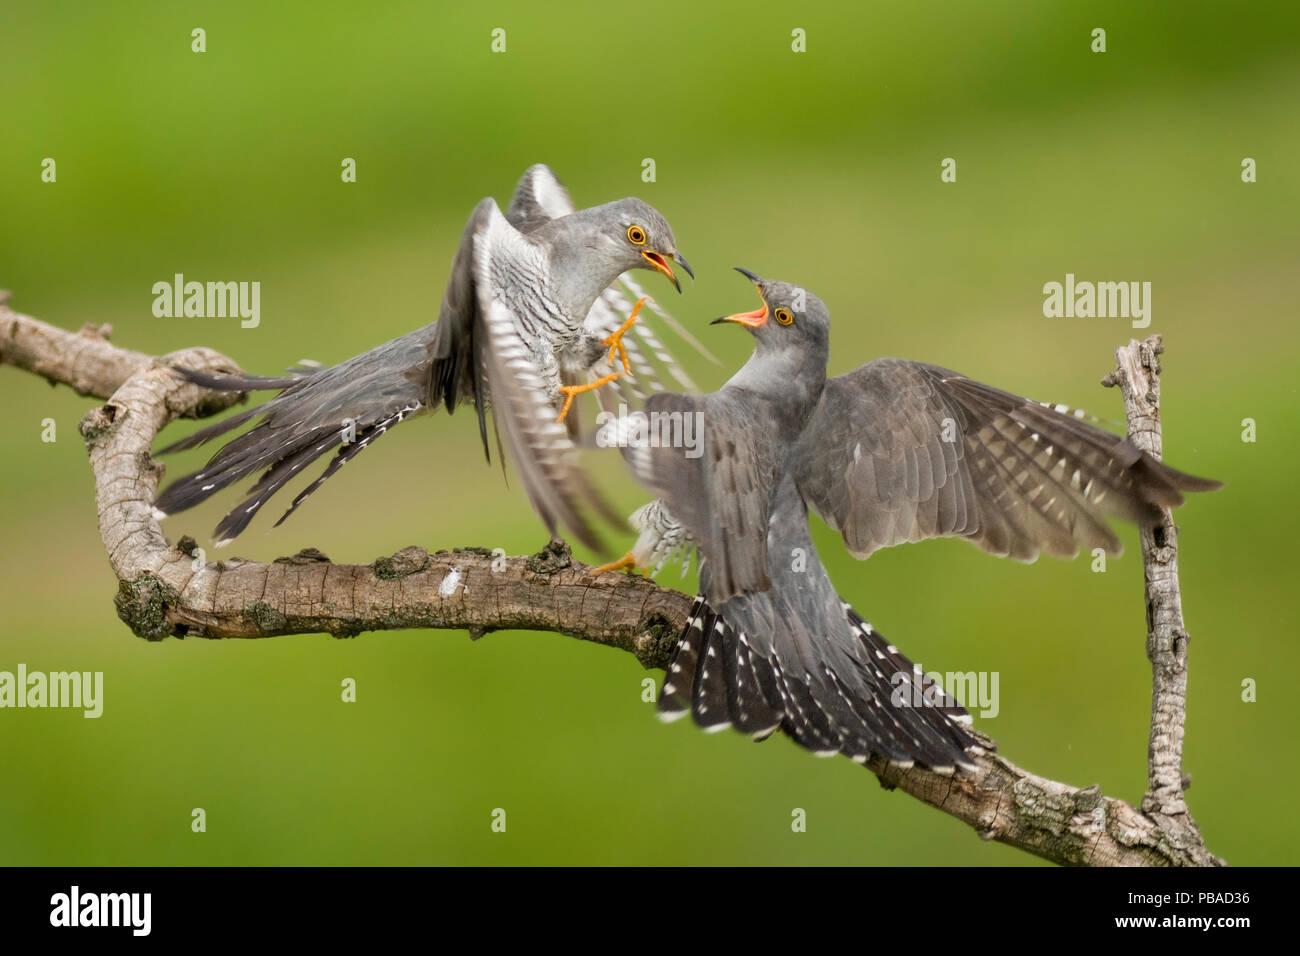 DUPLICATE Cuckoos (Cuculus canorus) squabbling, Kiskunsagi National Park, Pusztaszer, Hungary. February. - Stock Image